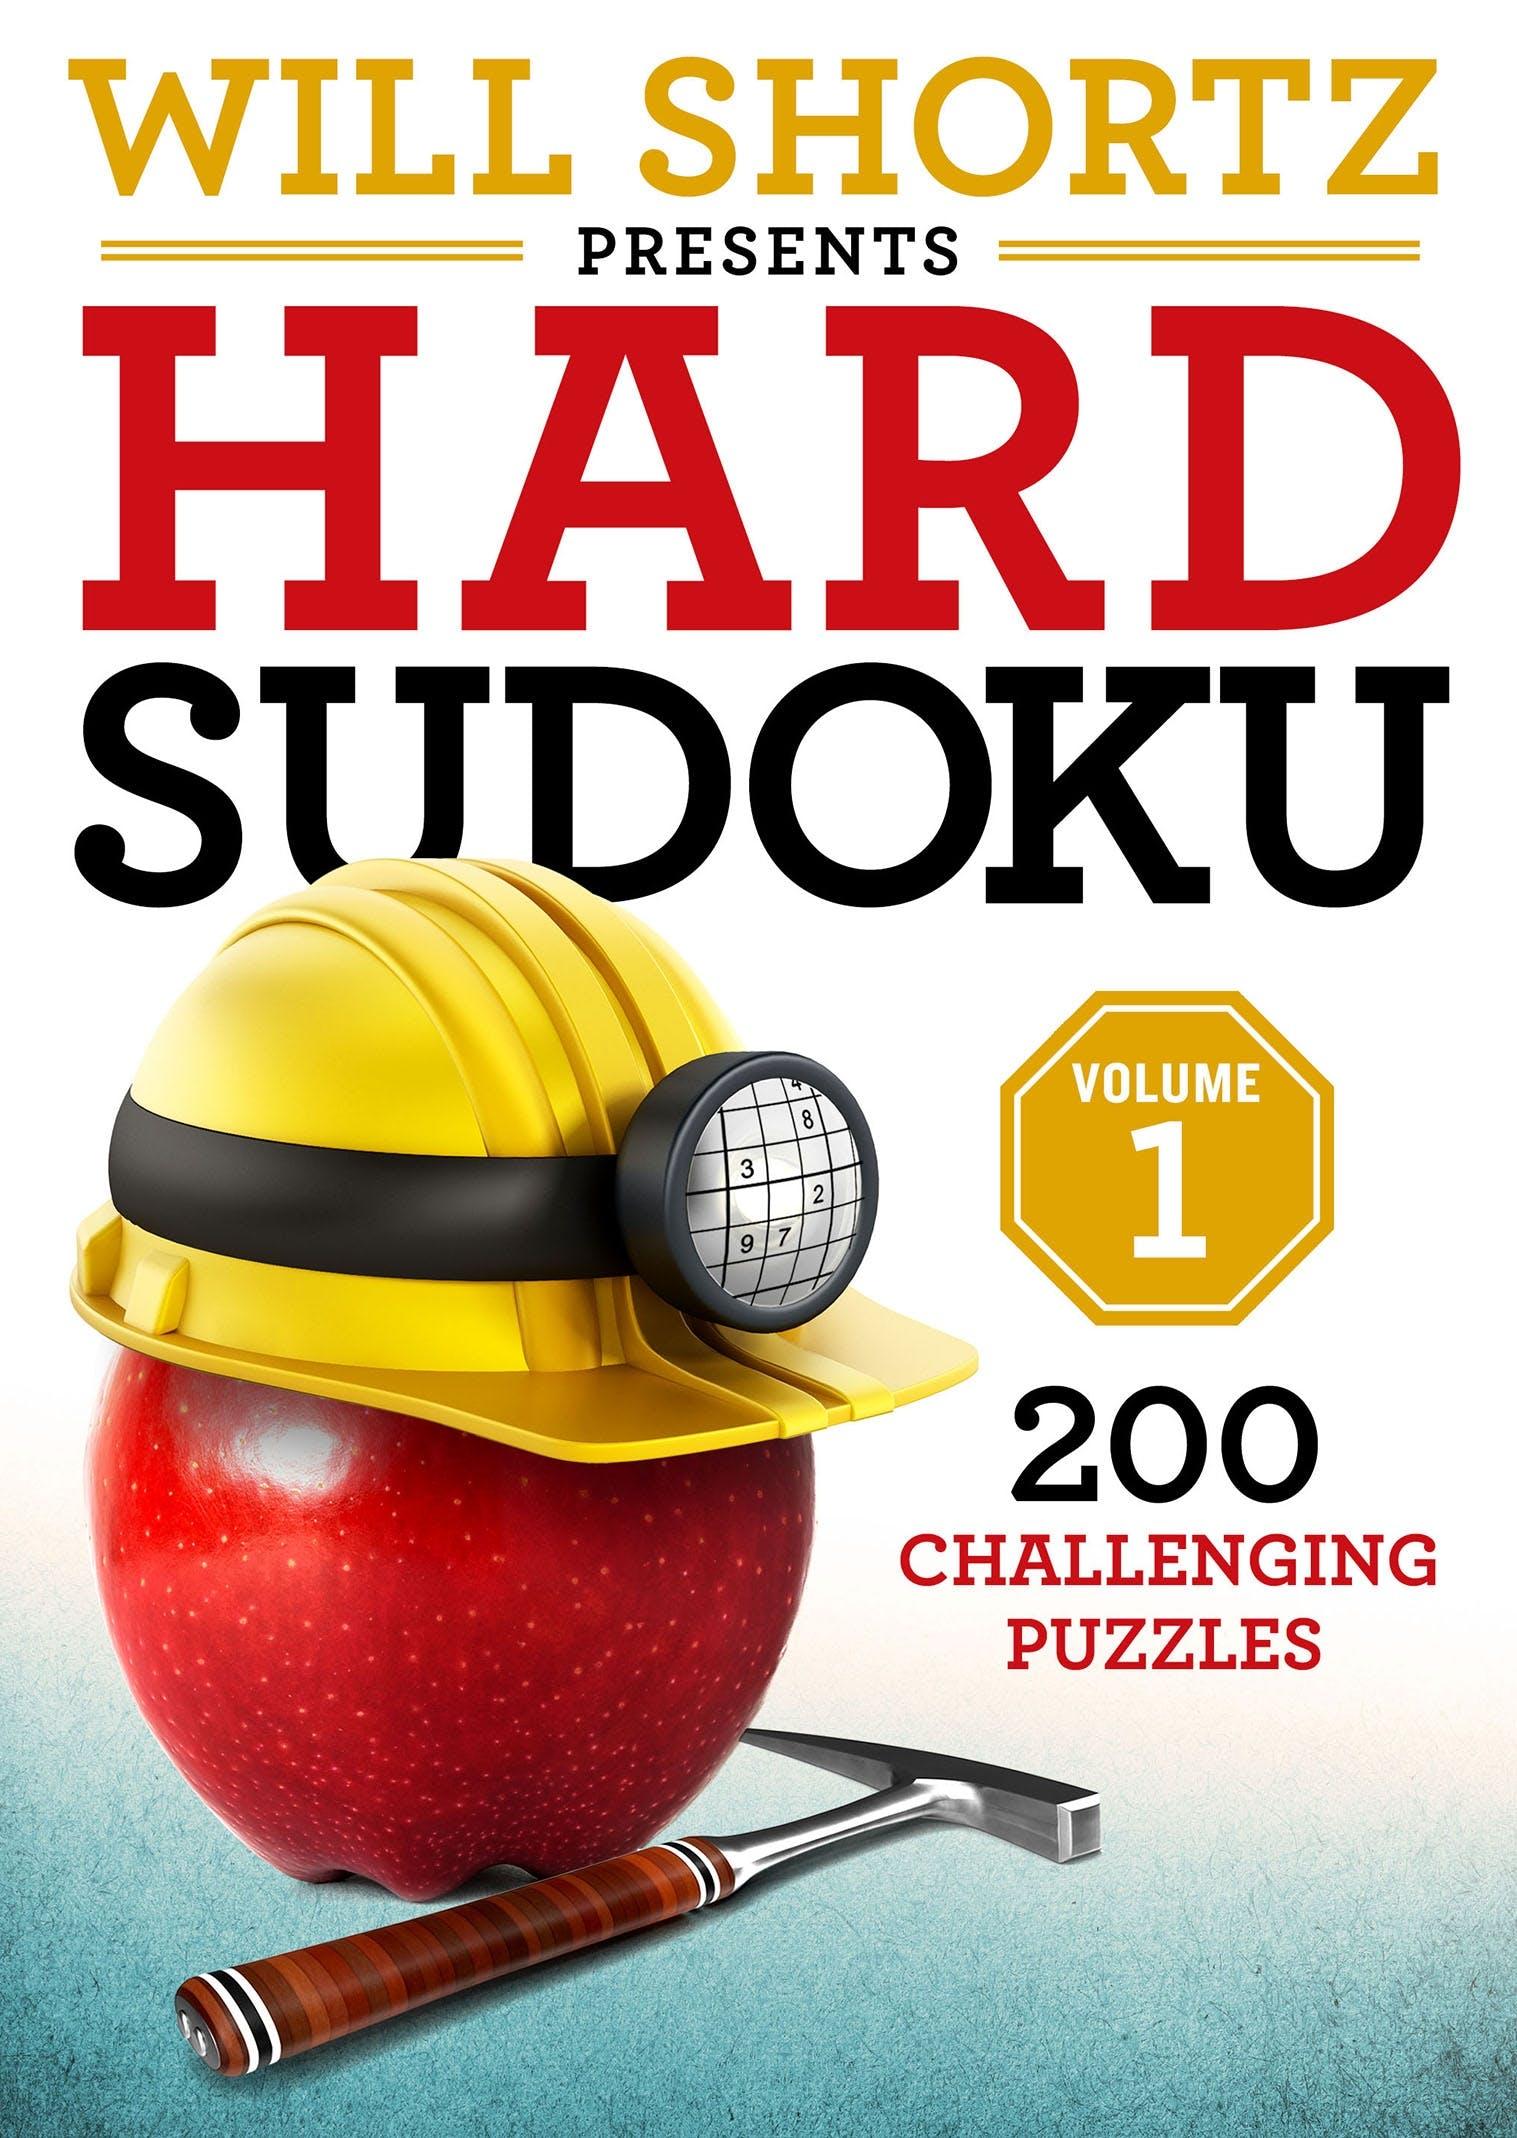 Image of Will Shortz Presents Hard Sudoku Volume 1